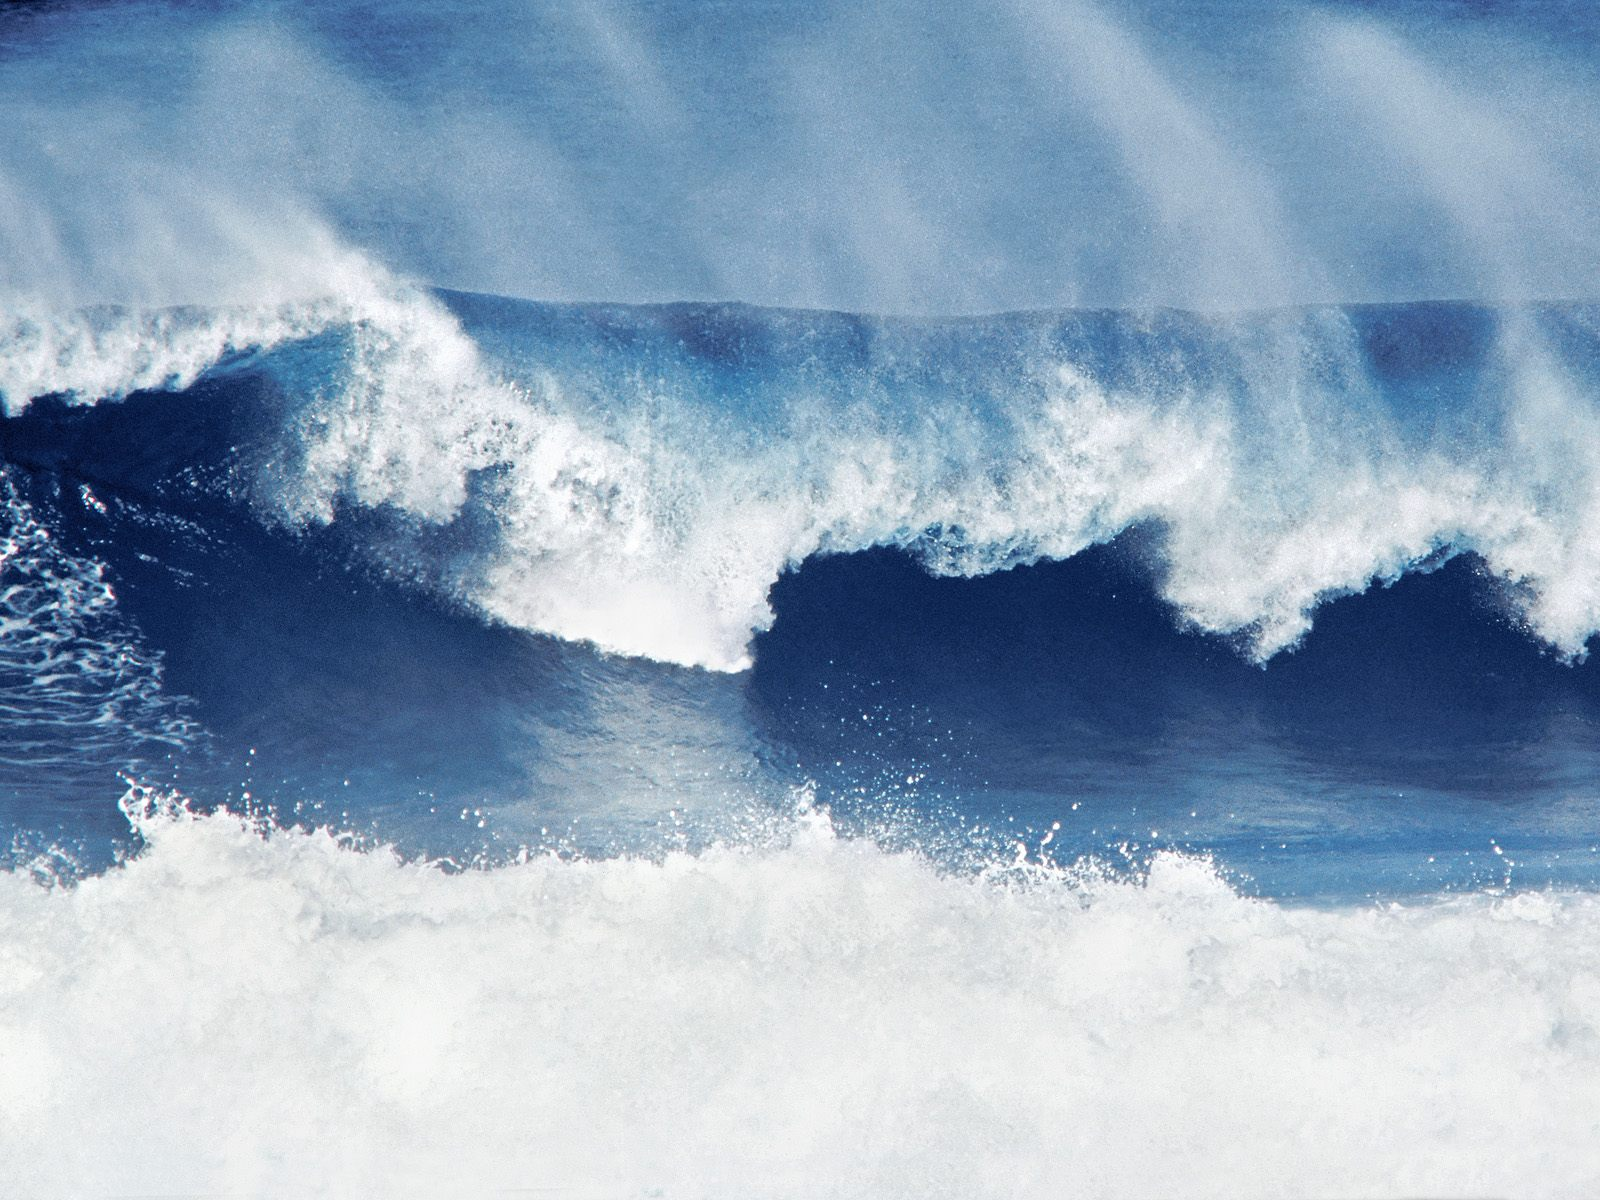 Ocean Waves Wallpaper wallpaper wallpaper hd background desktop 1600x1200